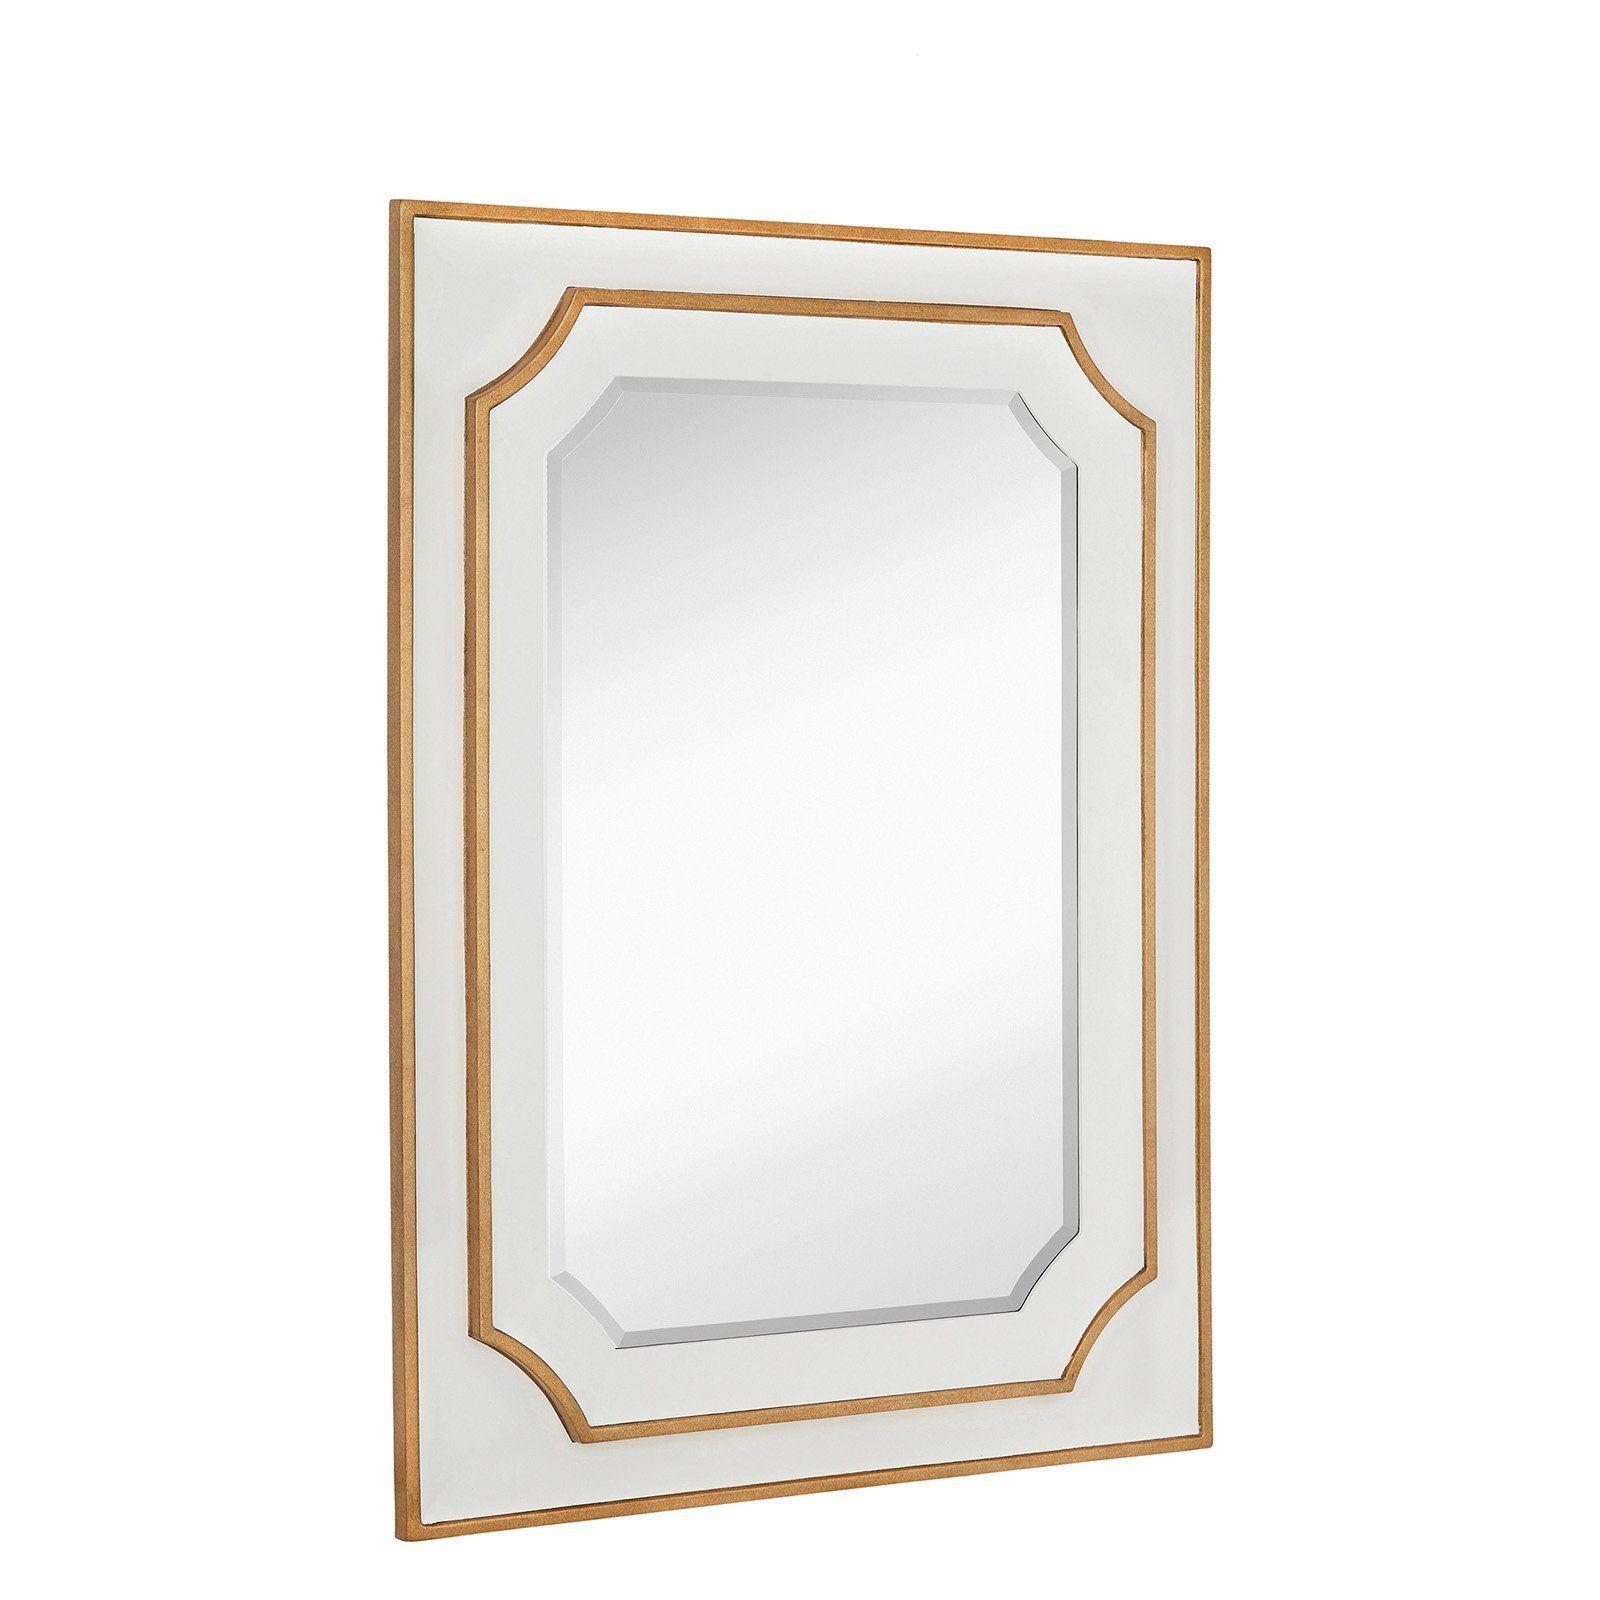 Majestic Mirror Rectangular Beveled Glass Wooden Frame Wall Mirror